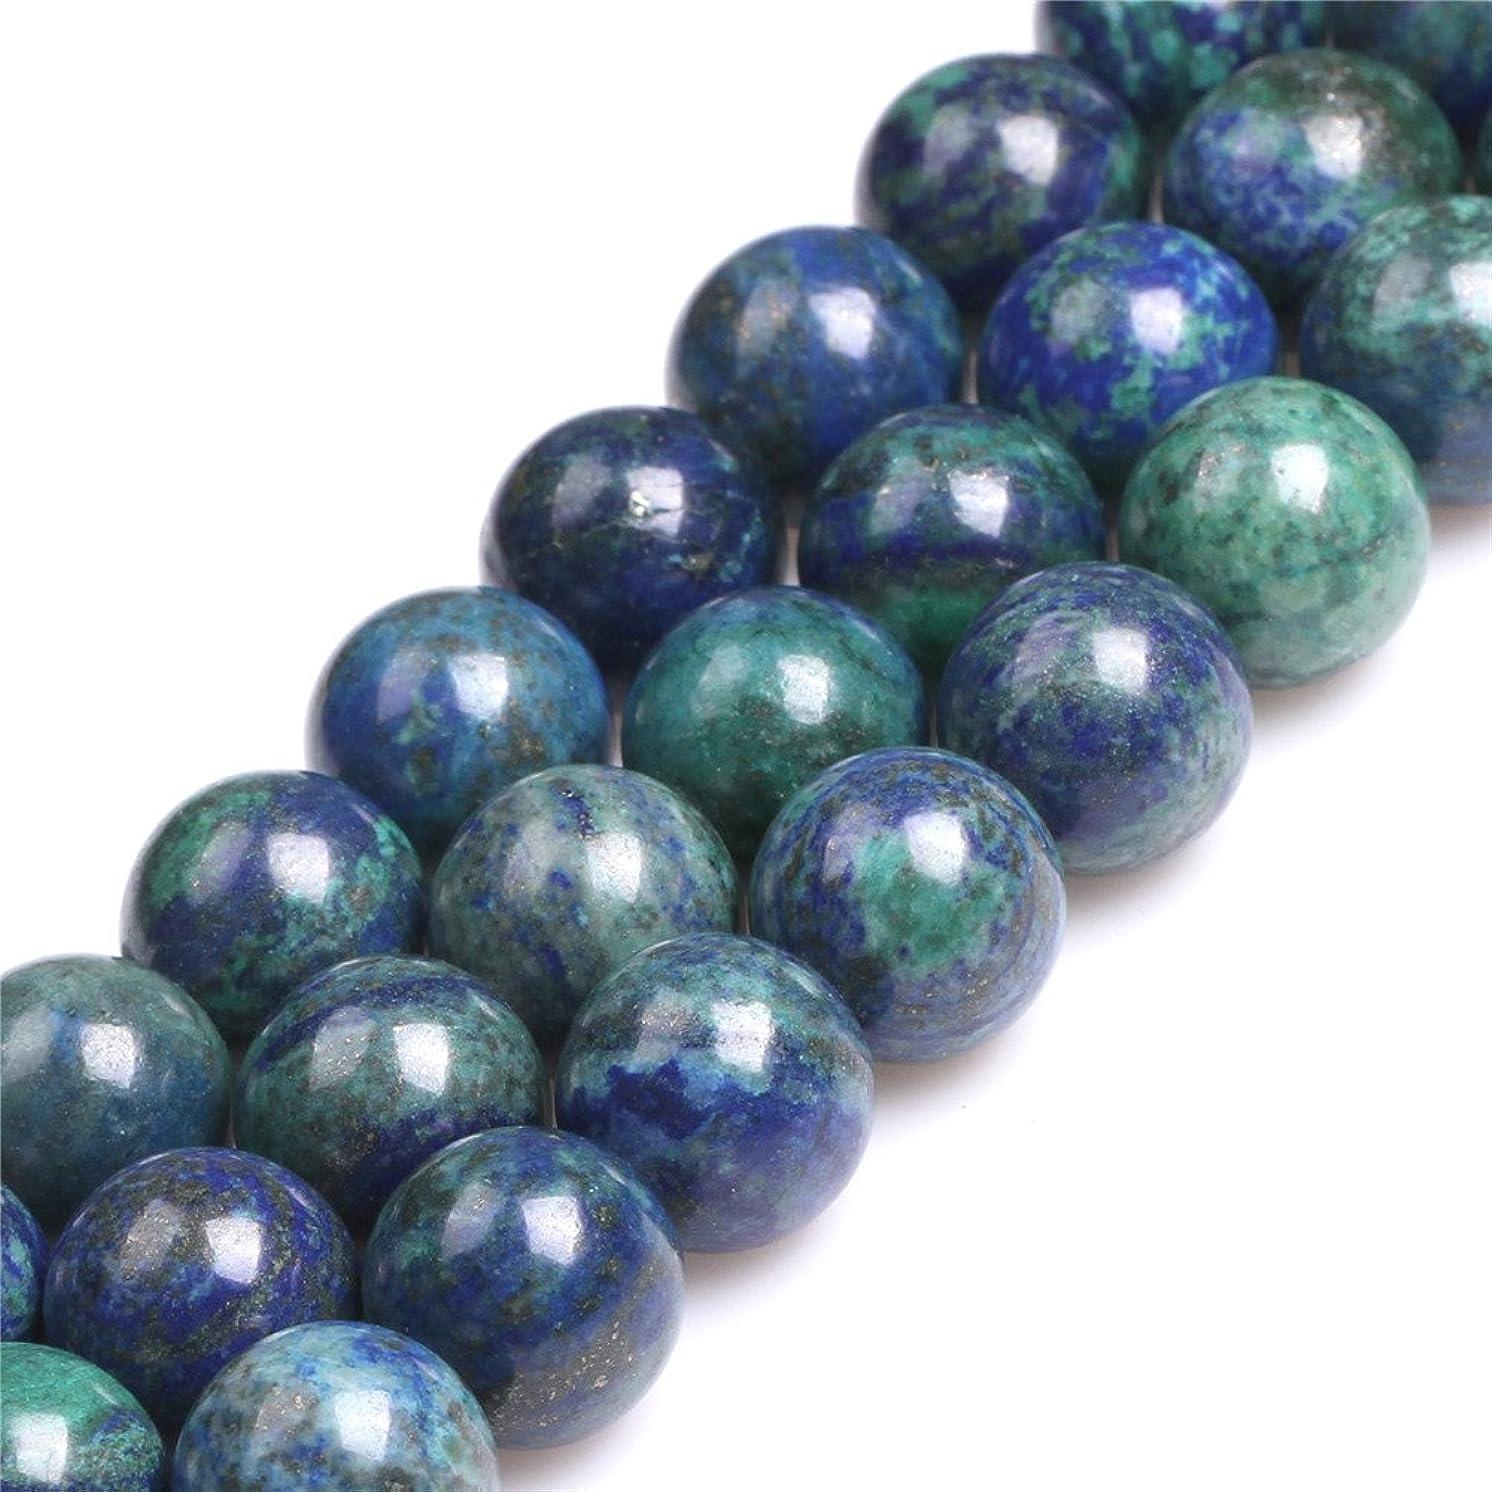 Lapis Lazuli Malachite Beads for Jewelry Making Gemstone Semi Precious 16mm Round 15